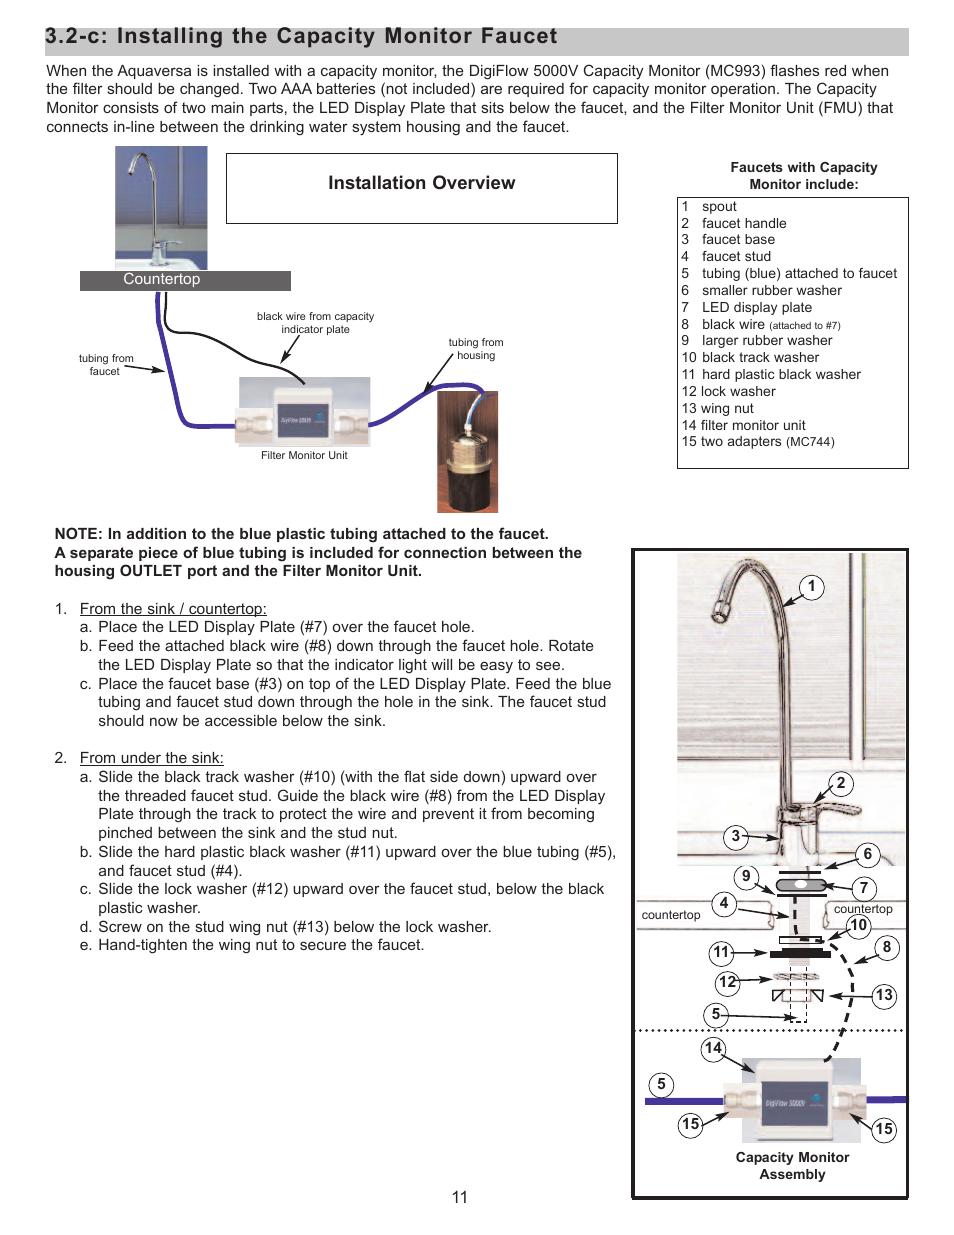 Luxury Wire Nut Capacity Chart Photos - Wiring Schematics and ...